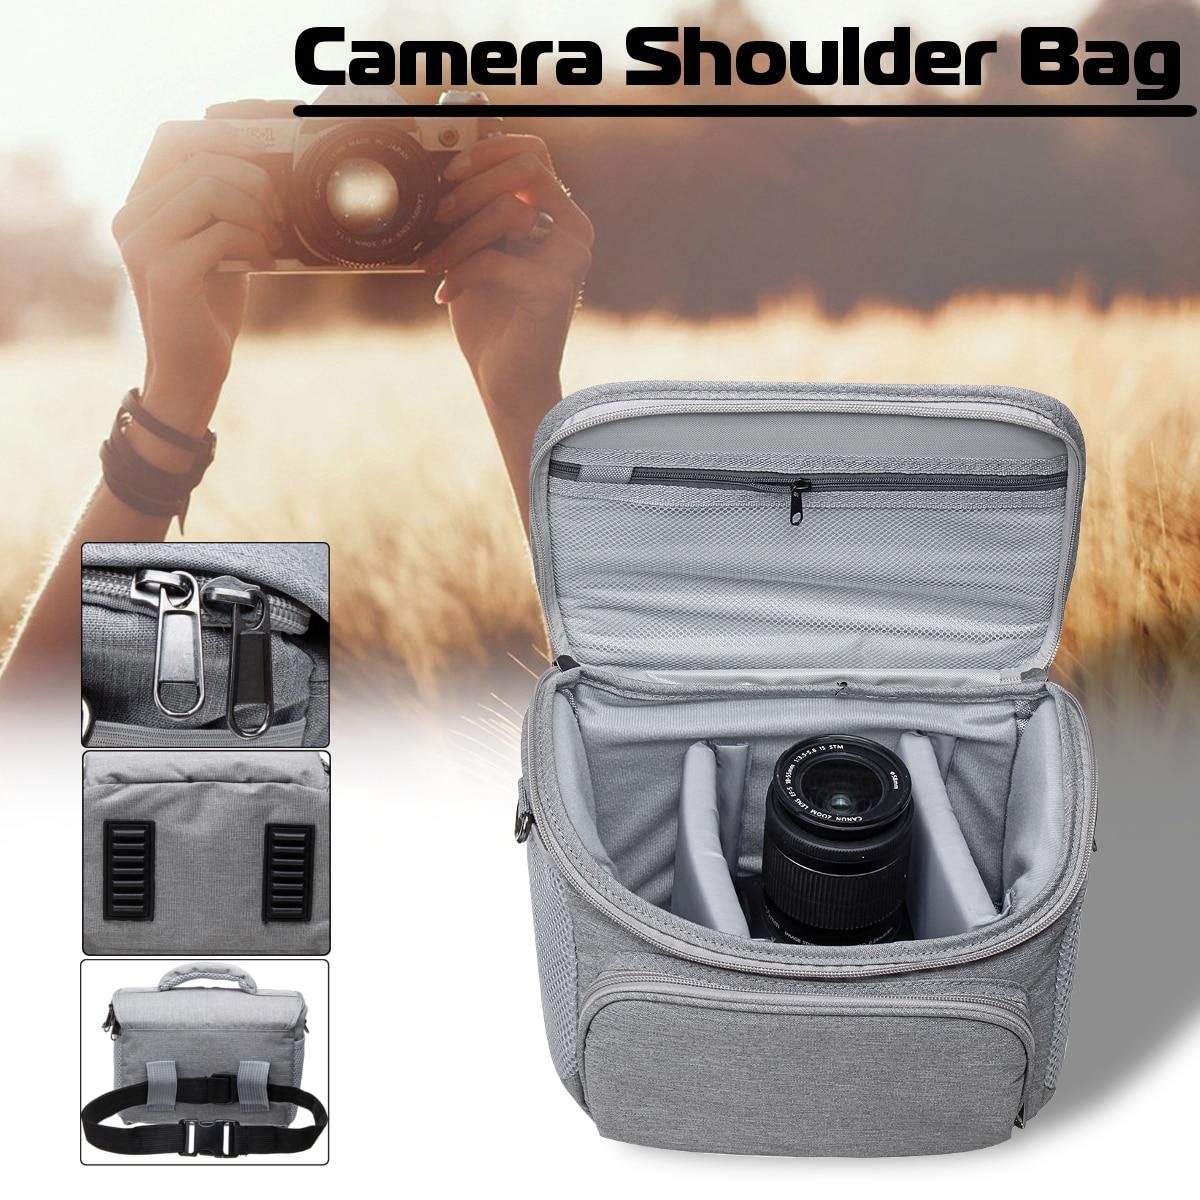 Waterproof Camera Carry Handbag Shoulder Bag+Rain Cover for Canon-Nikon DSLR Adjustable Waistband Shoulder Strap Gray Nylon